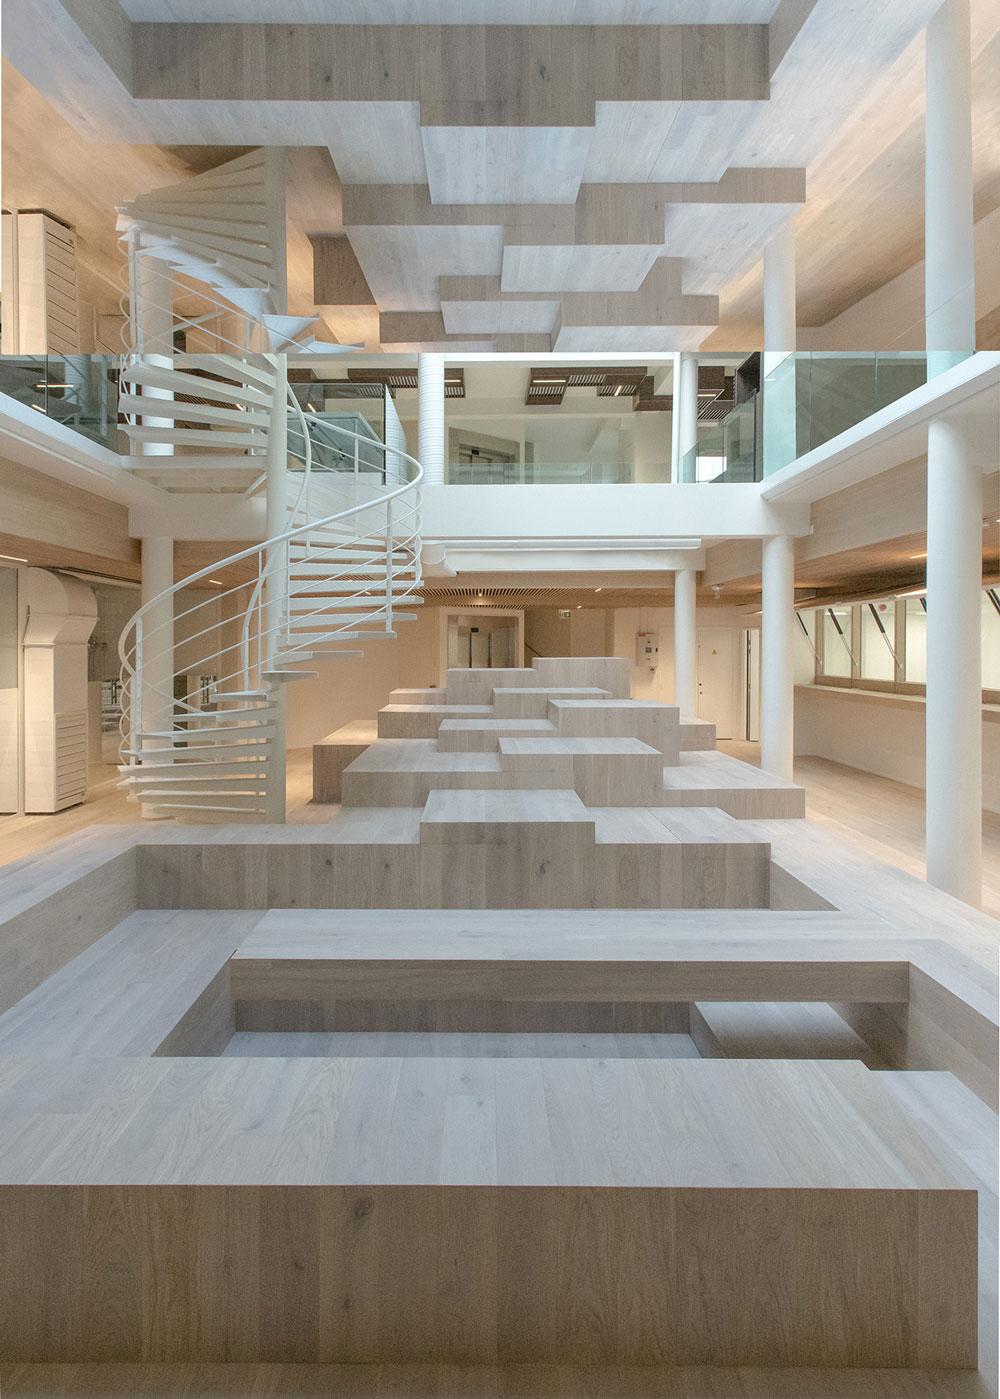 Image: Studio Malka Architecture